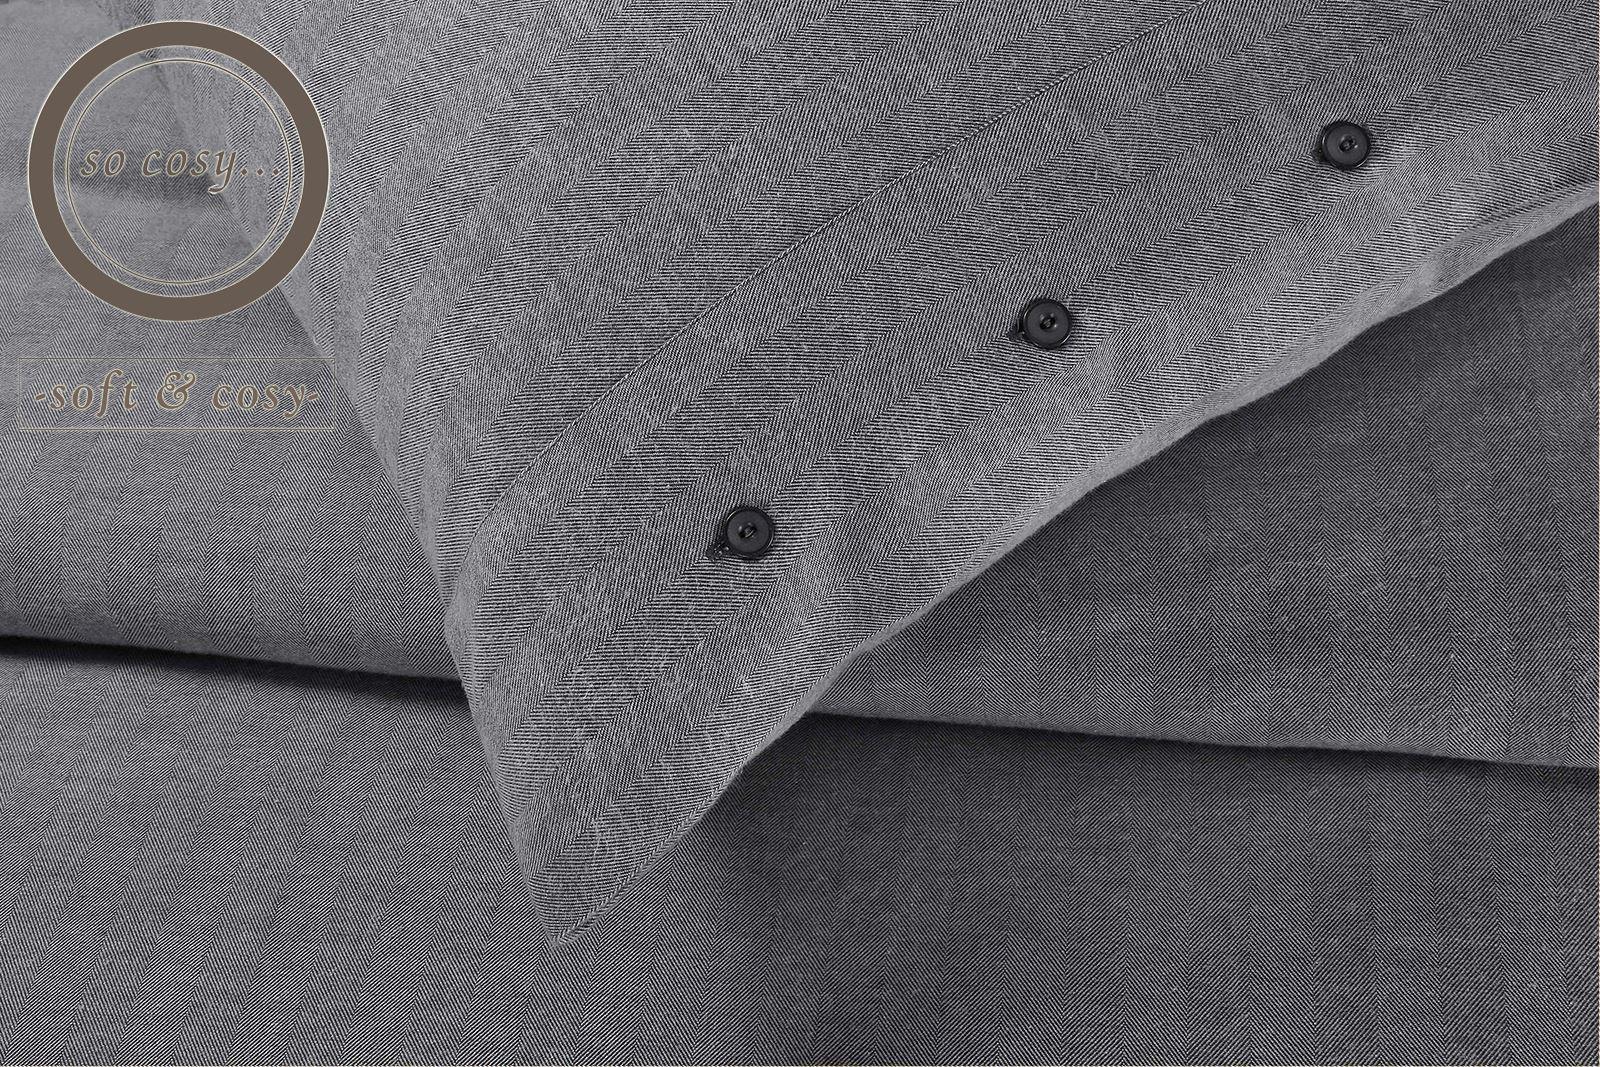 Herringbone Woven 100/% Cotton Flannel Duvet Cover Bedding Set Single Double King